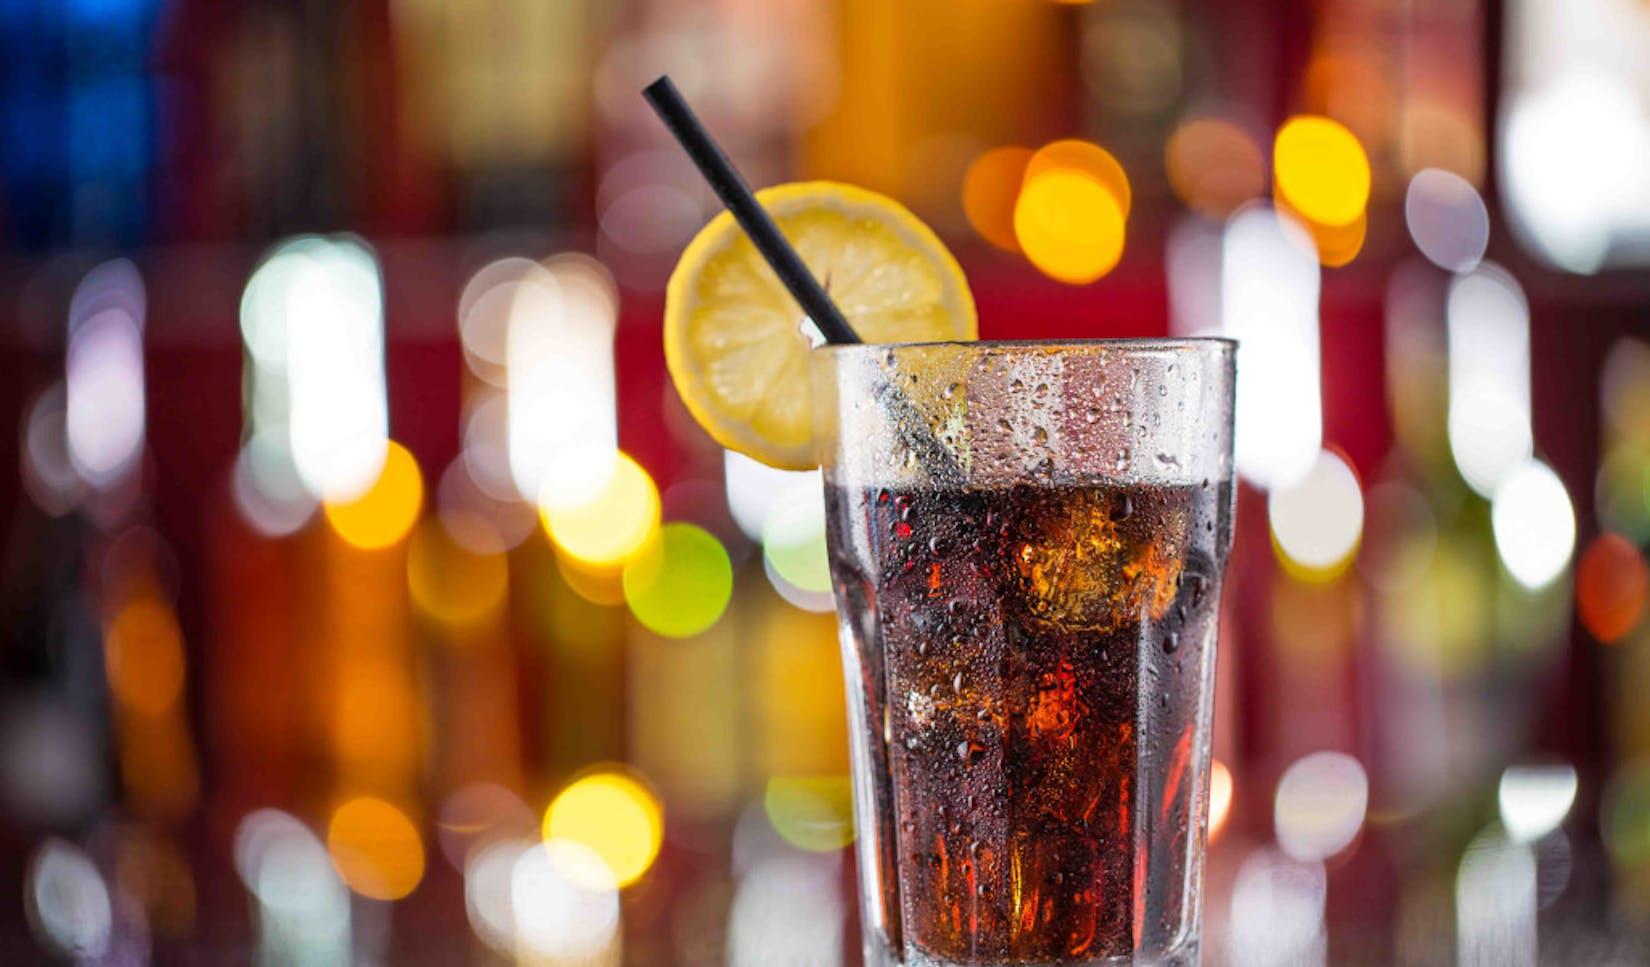 Arkar Soe Cold Drink Shop | yathar